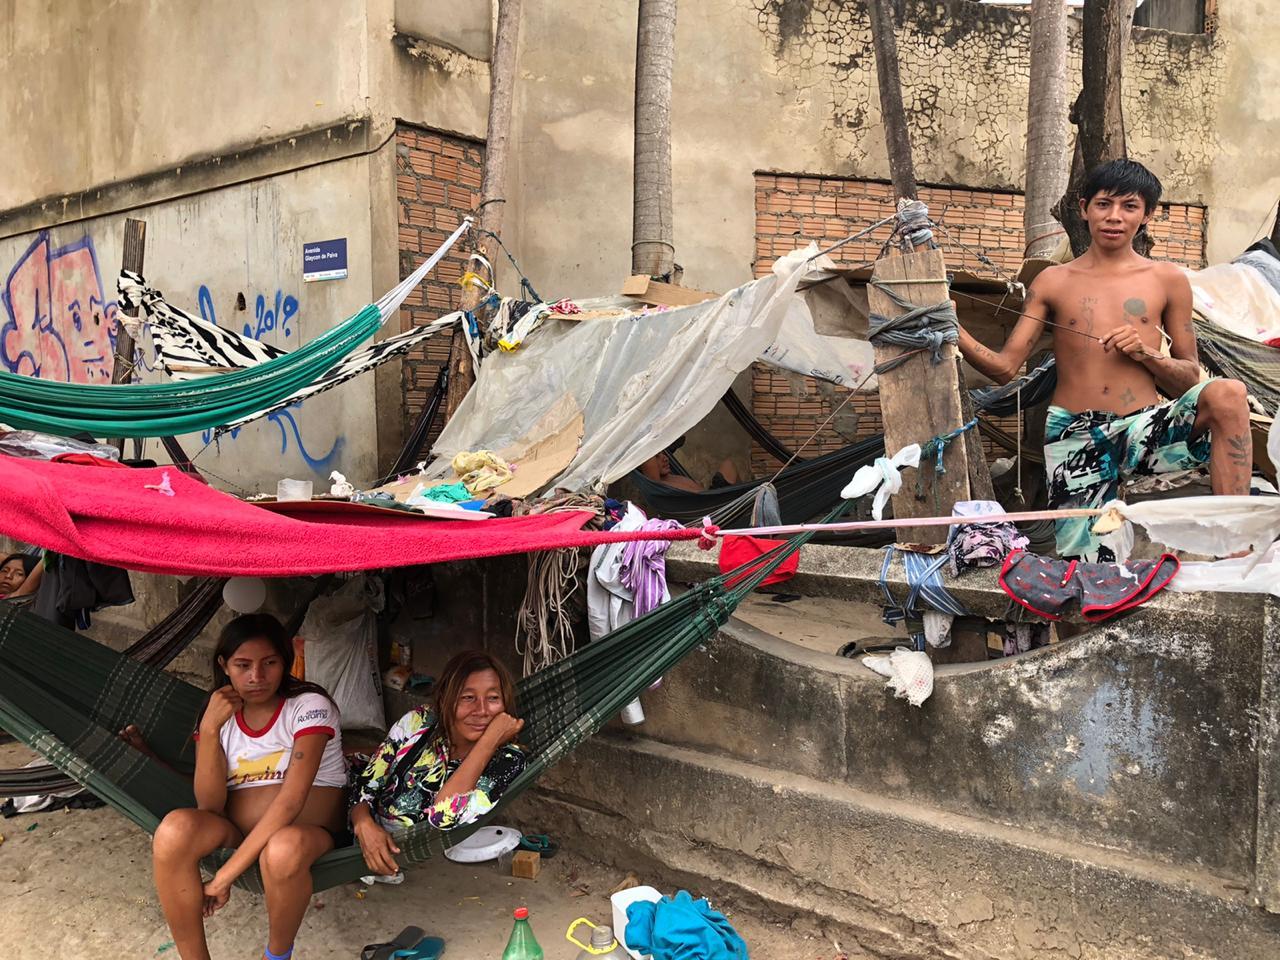 Os indígenas do Brasil pedem socorro contra a Covid-19